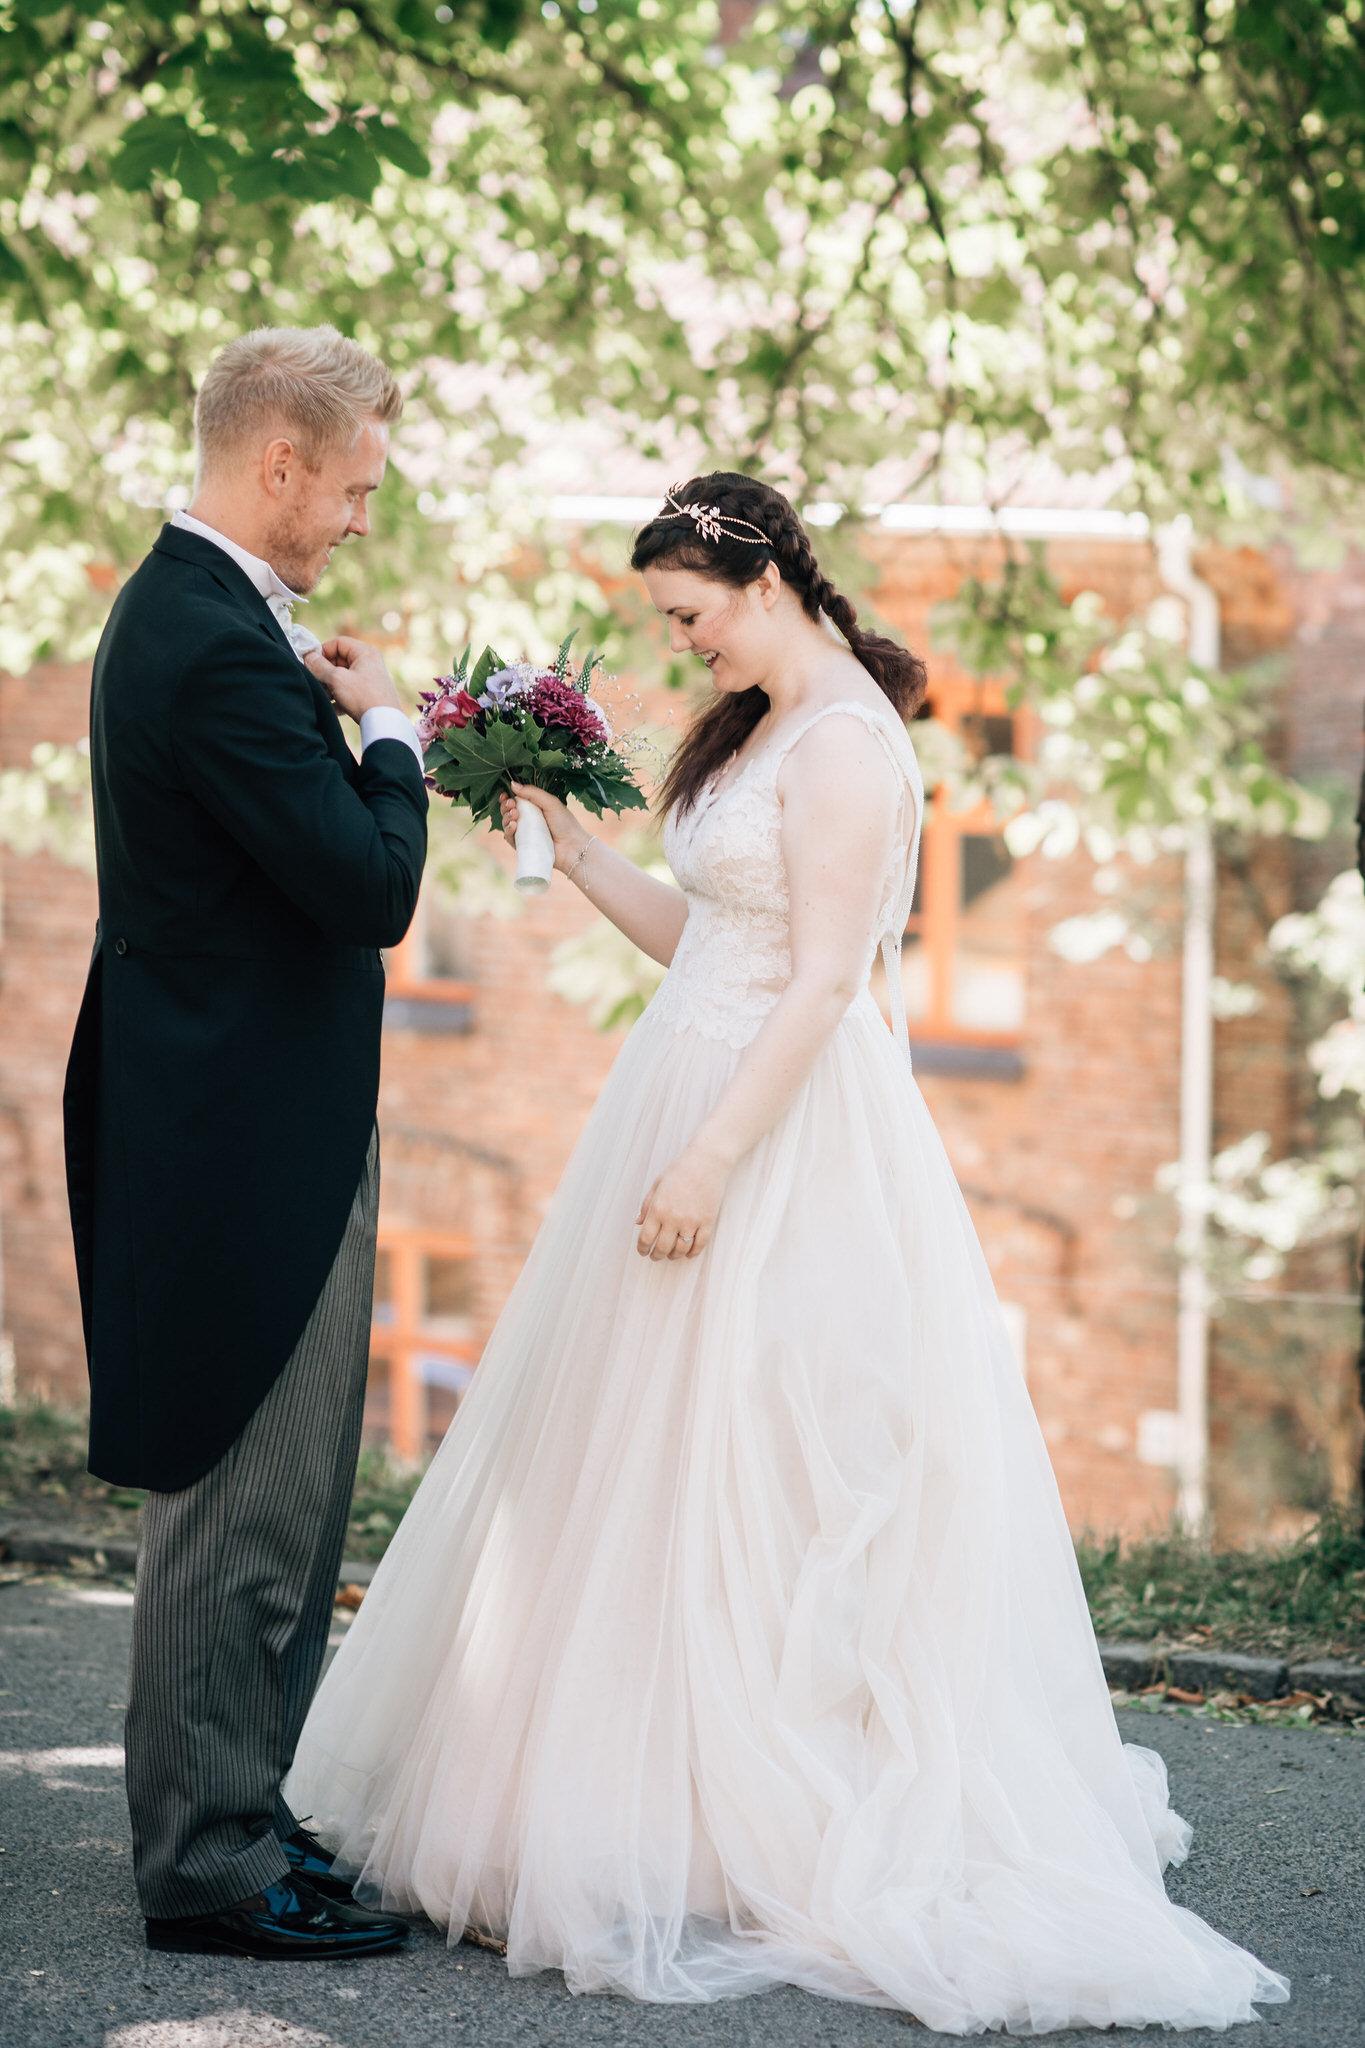 _N859788-fotograf-vestfold-bryllupsfotograf-.jpg